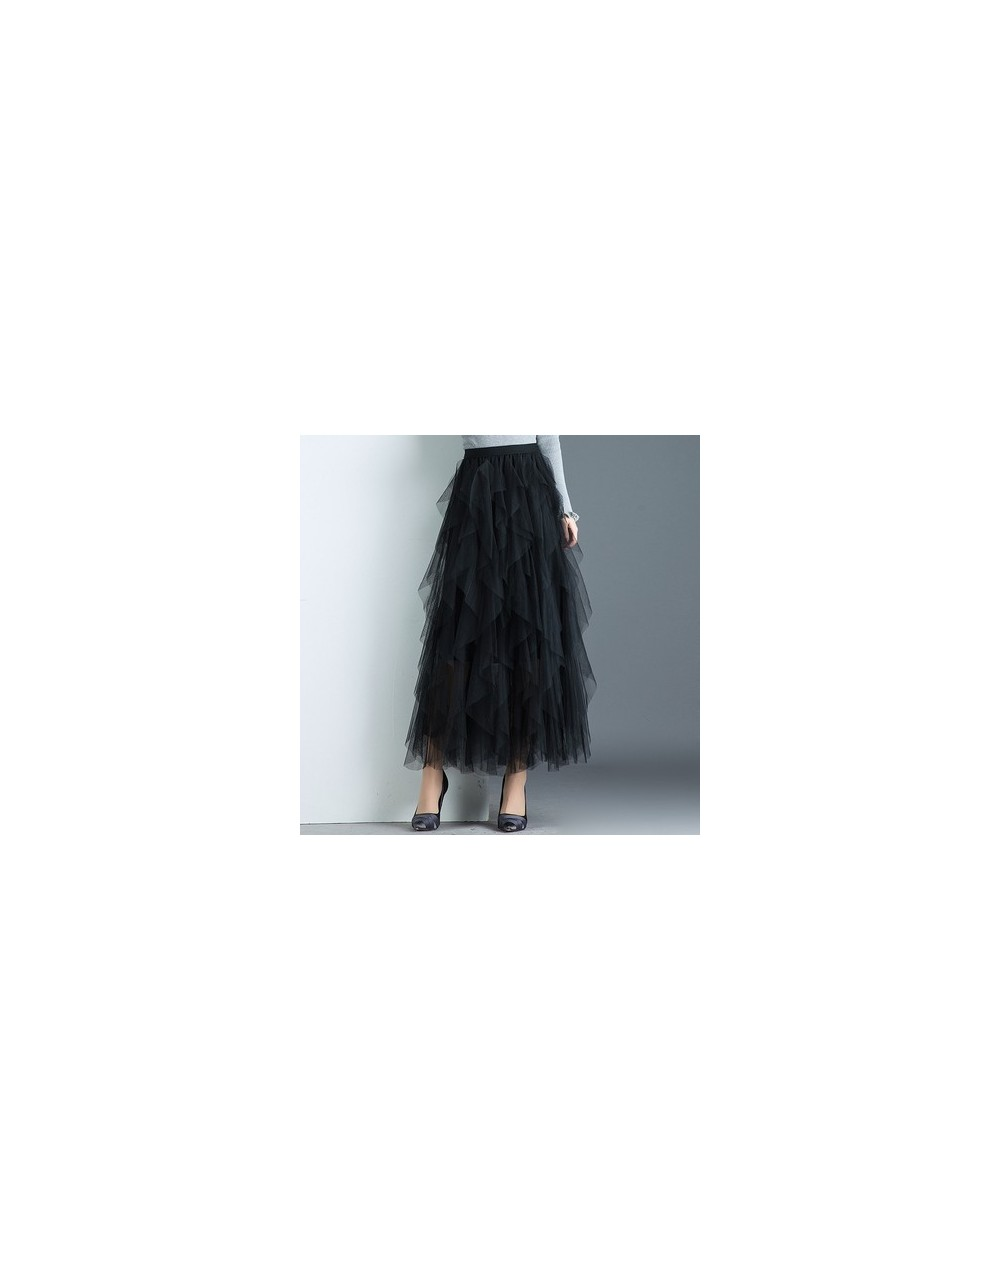 Women irregular Tulle Skirts Fashion Elastic High Waist Mesh Tutu Skirt Pleated Long Skirts Midi Skirt Saias Faldas Jupe Fem...